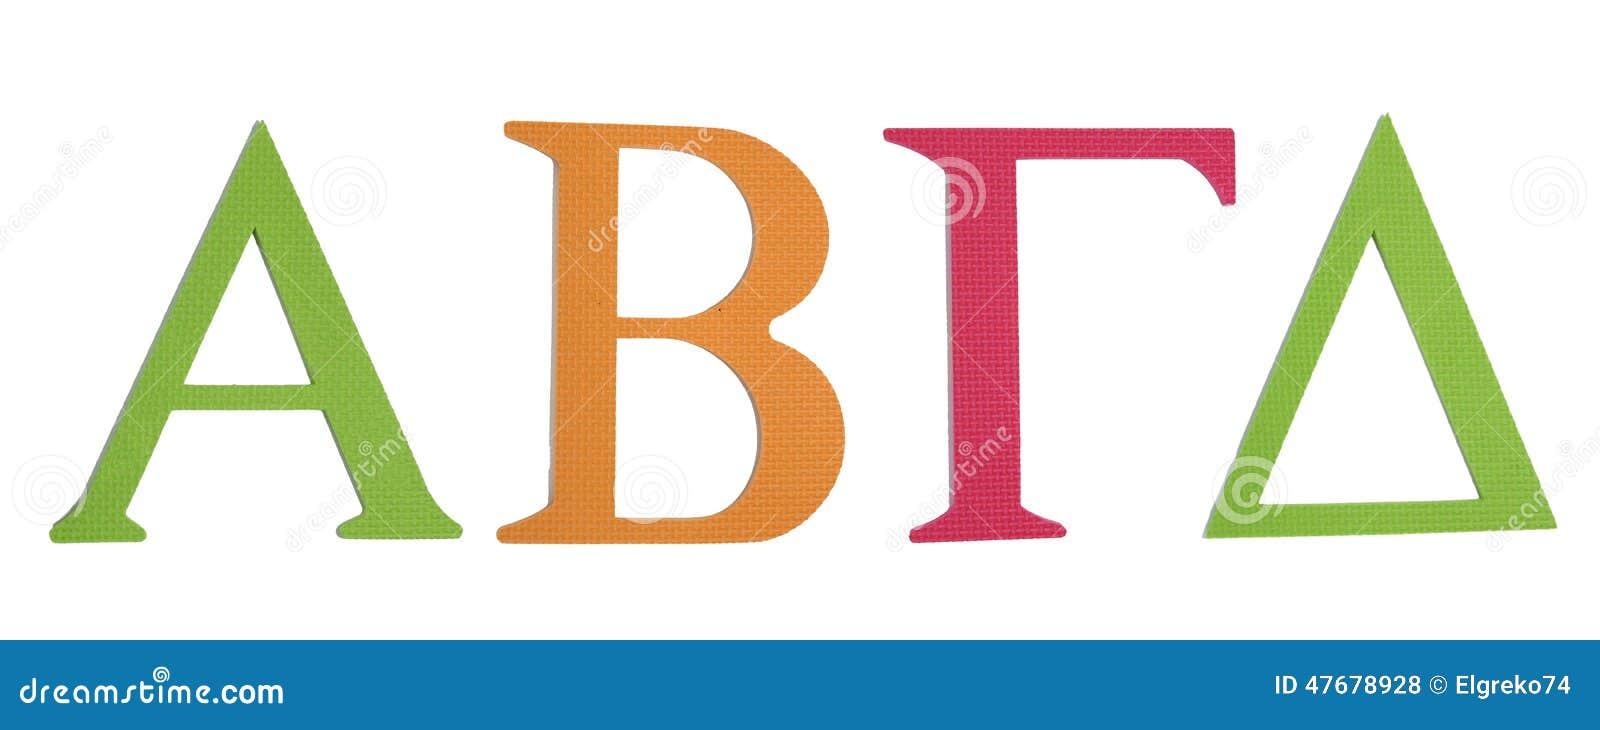 Colorful greek alphabet alpha bita gamma delta stock colorful greek alphabet alpha bita gamma delta biocorpaavc Image collections